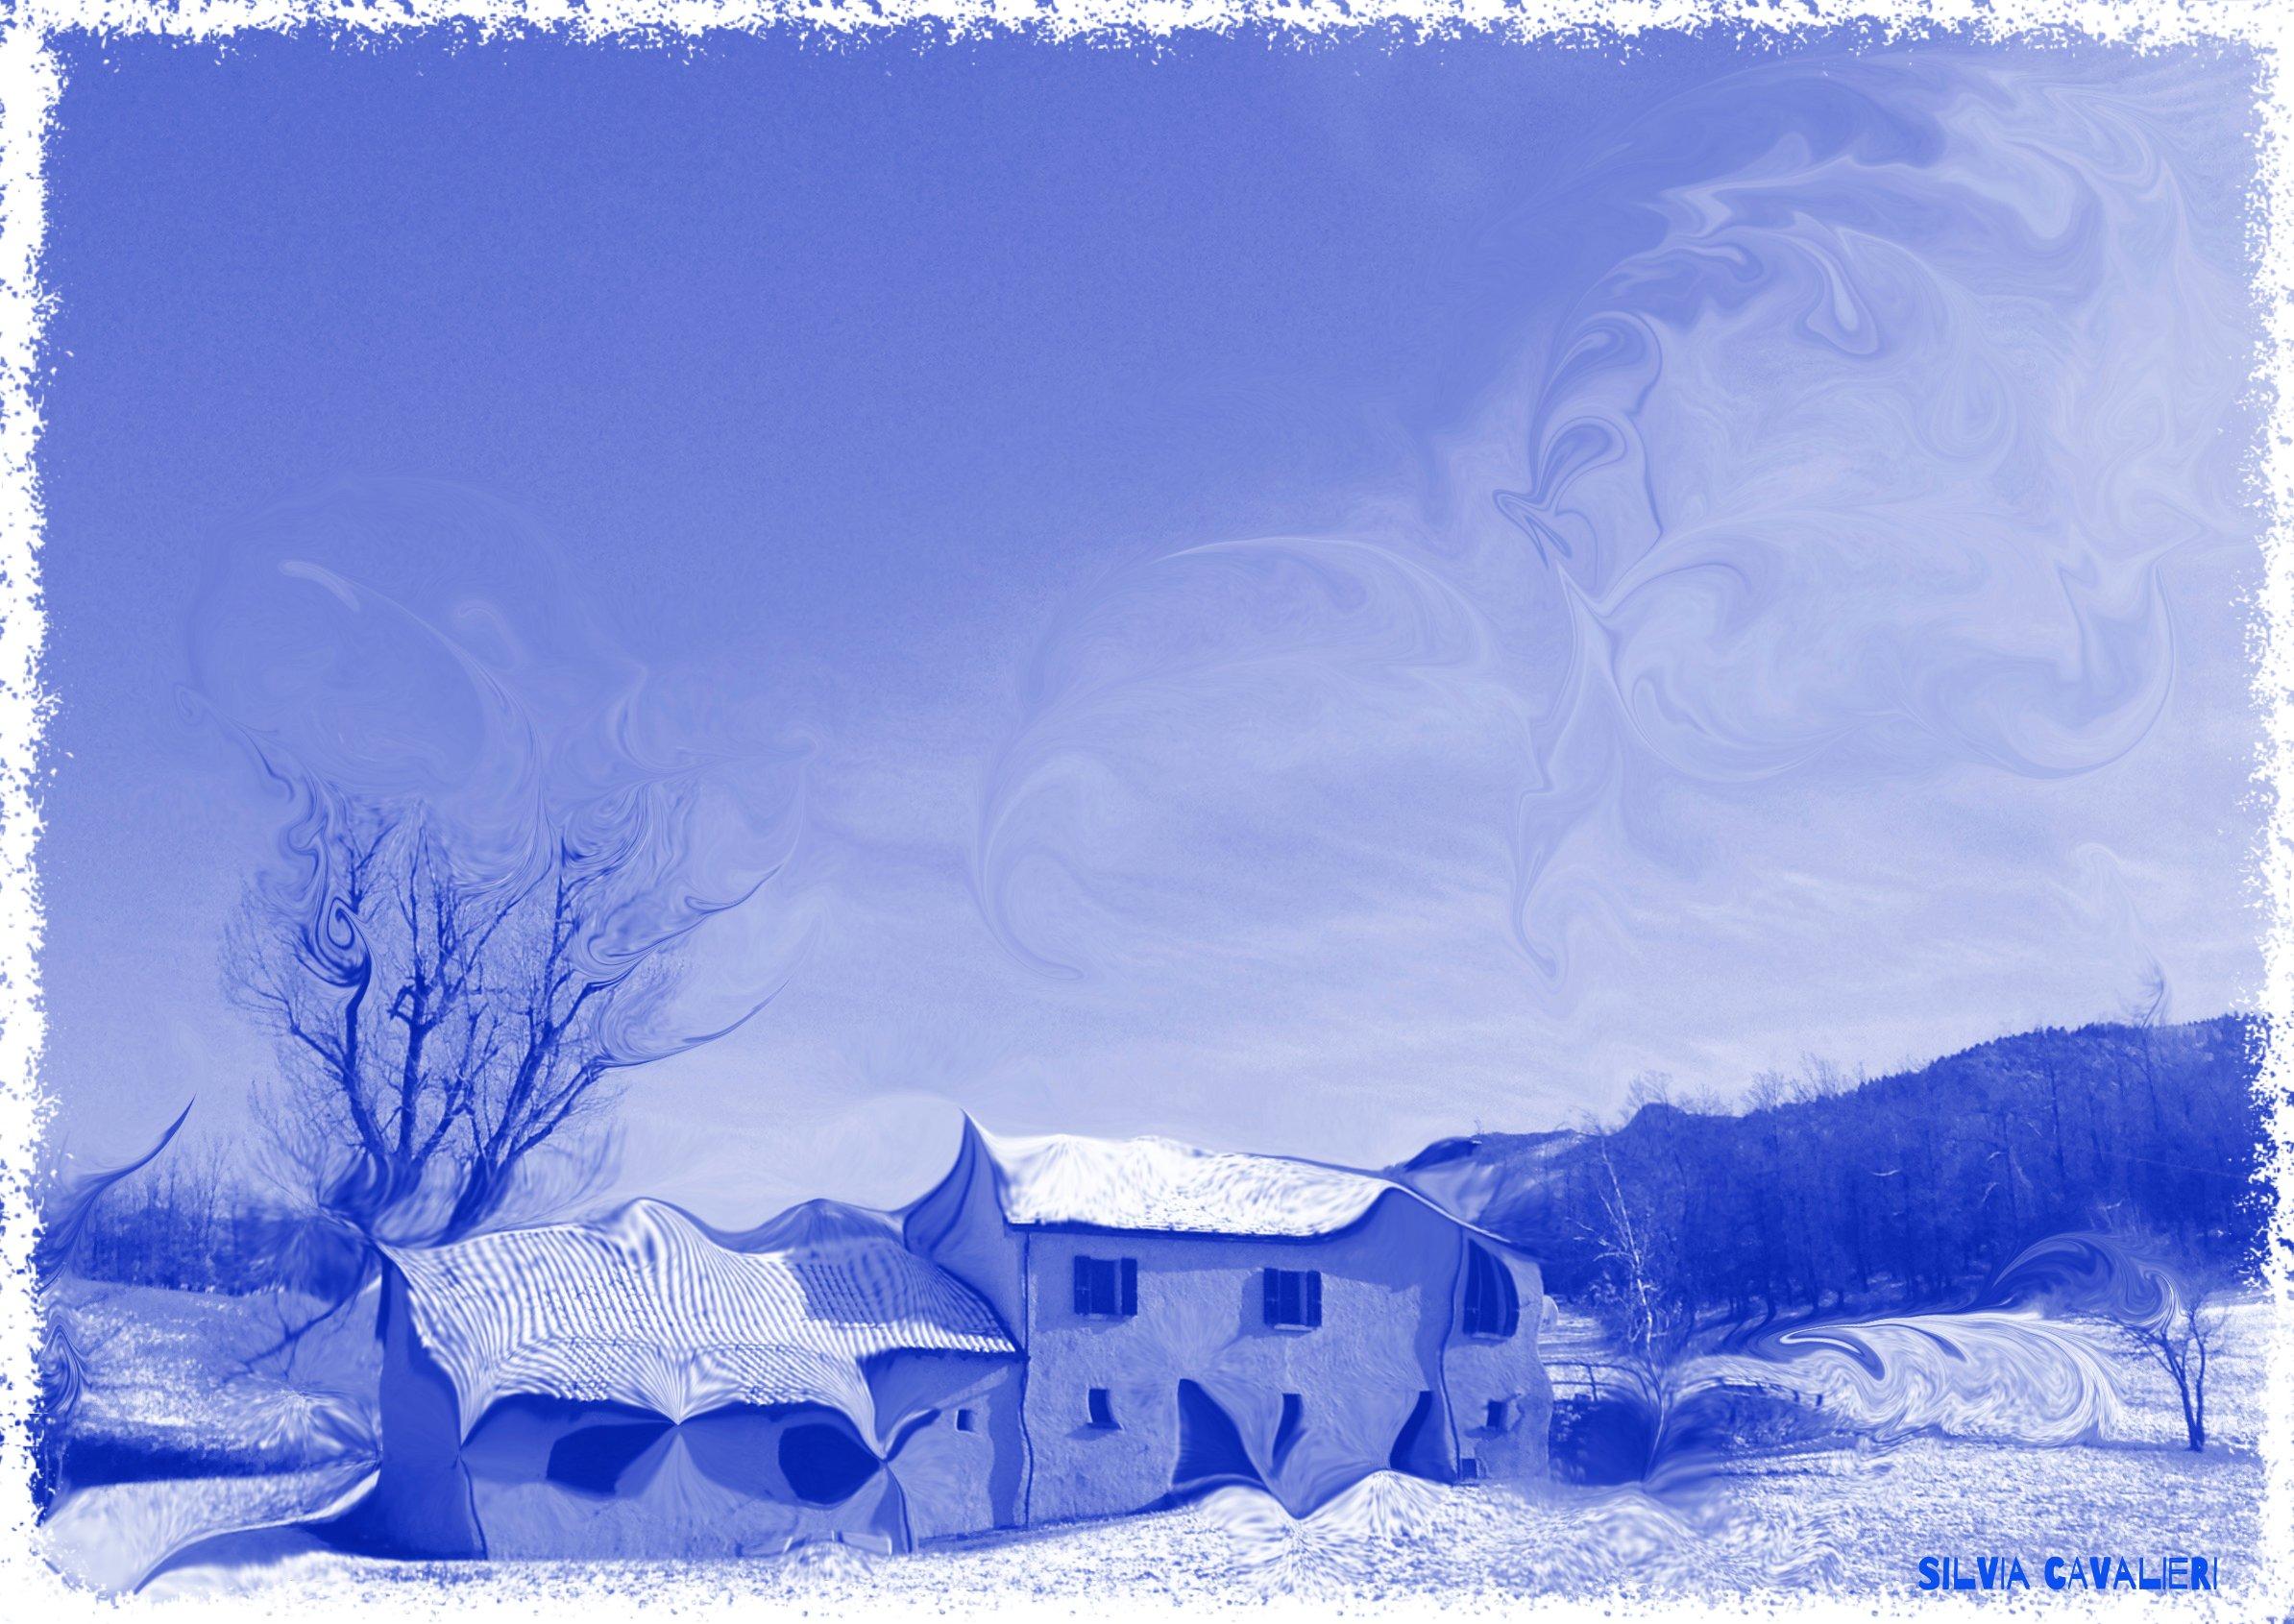 la casa stregata